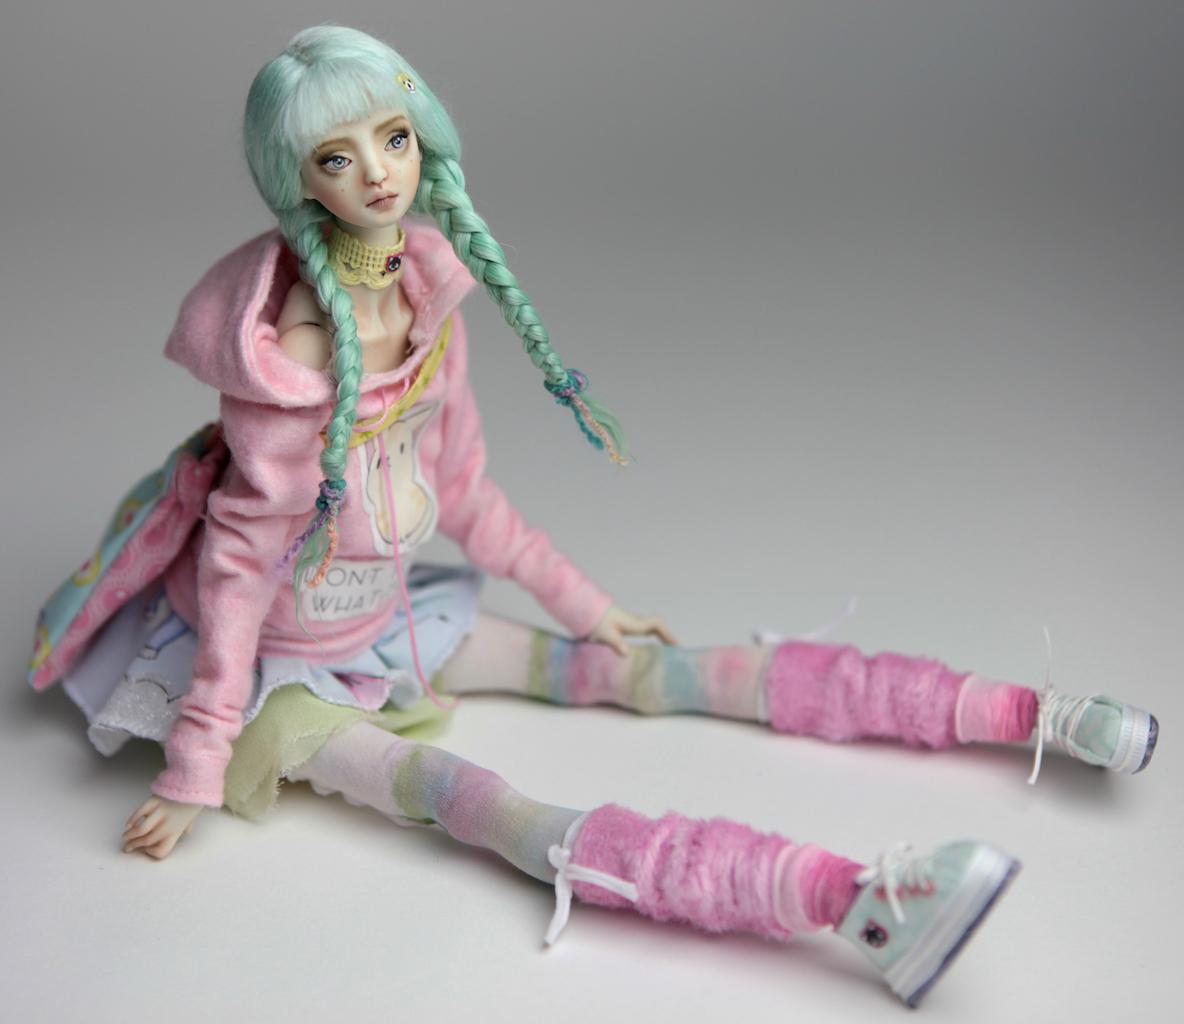 BJD Doll Ball Jointed Harajuku 2018 24 15 Porcelain BJD Harajuku Renaissance (Turquoise Hair)